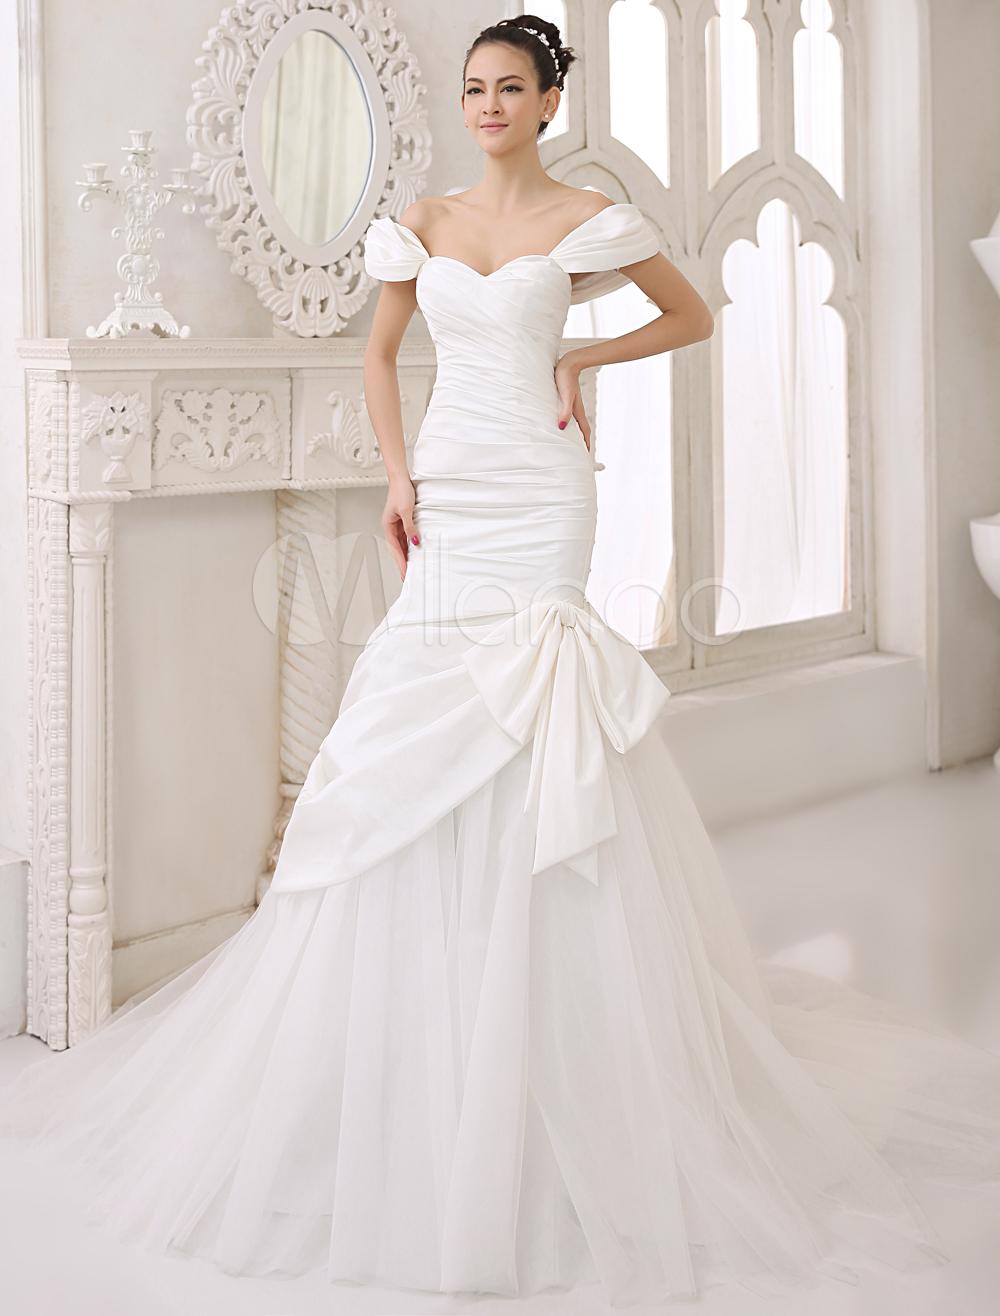 Chapel Train Bow Bridal Mermaid Wedding Dress Sweetheart Neck Off-The-Shoulder 6